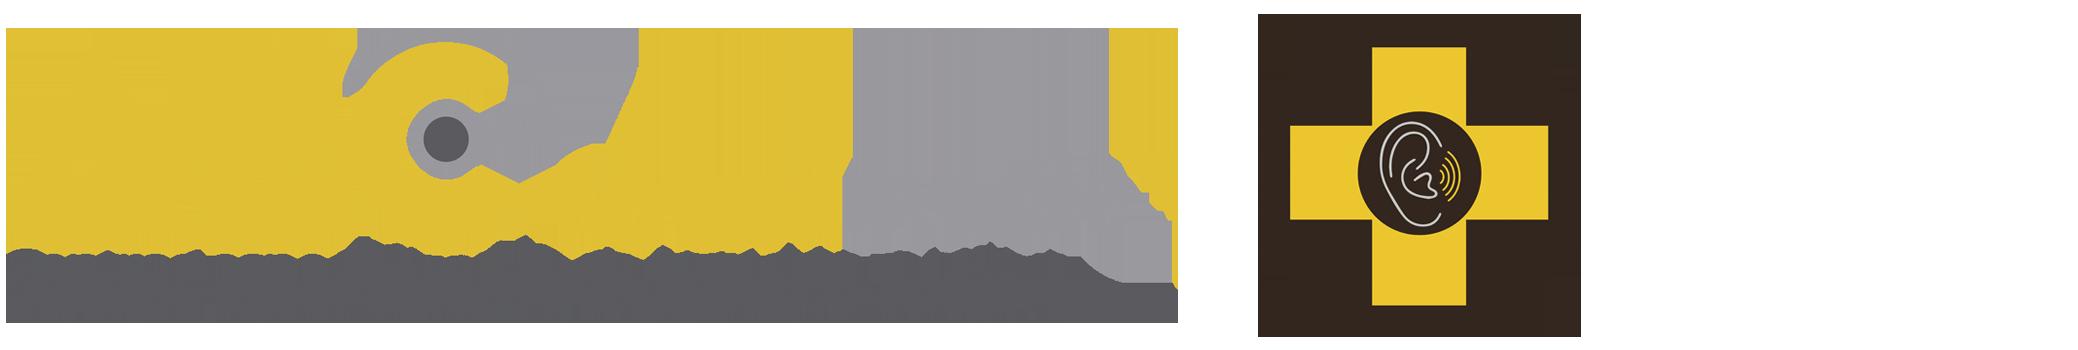 AEC Soundmedic